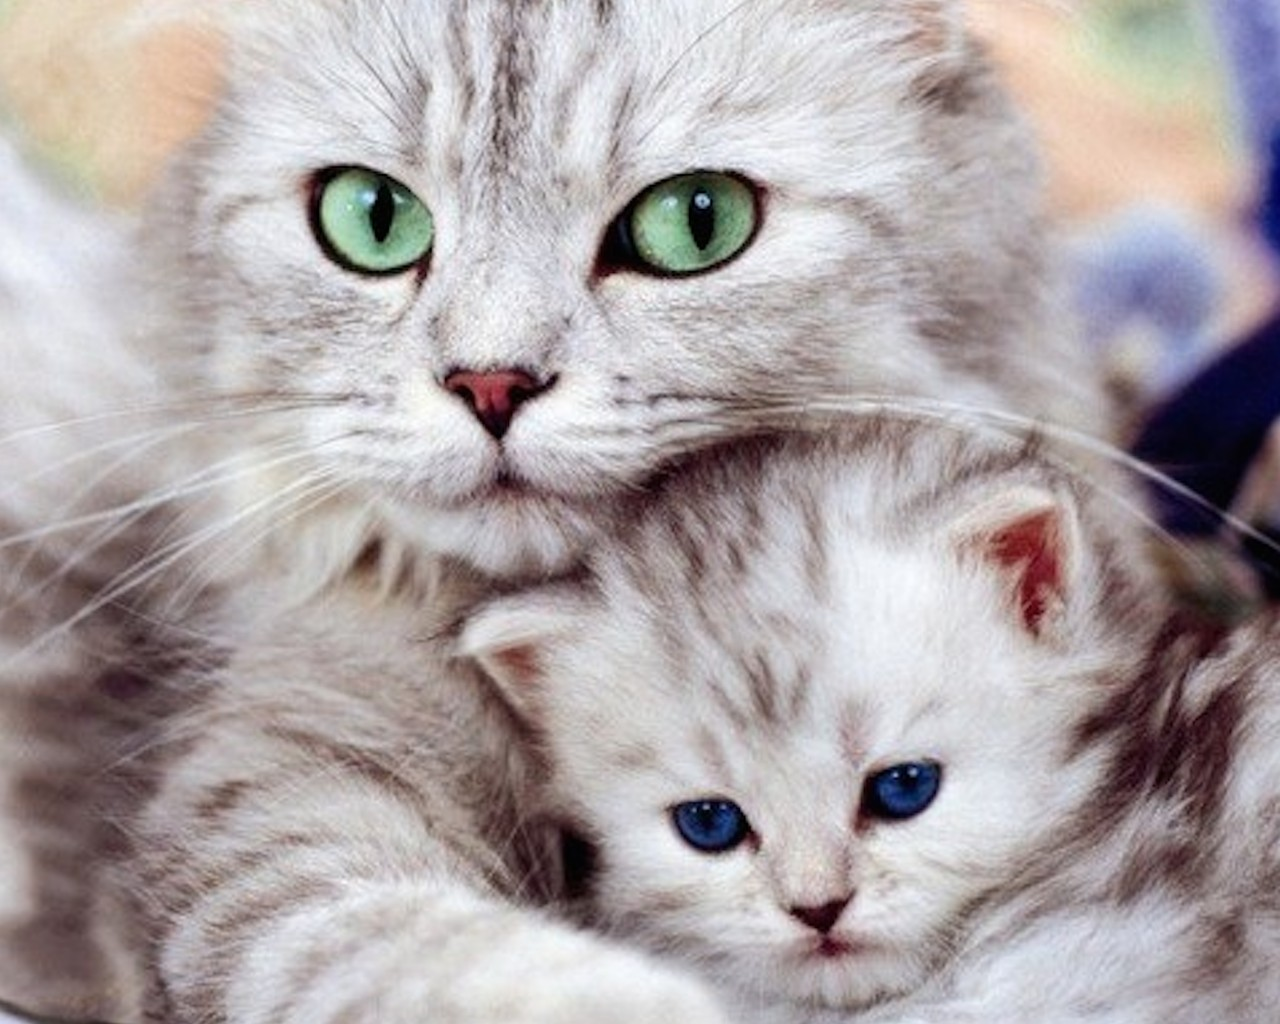 Cat Kitten Wallpaper-Free Animal Wallpaper